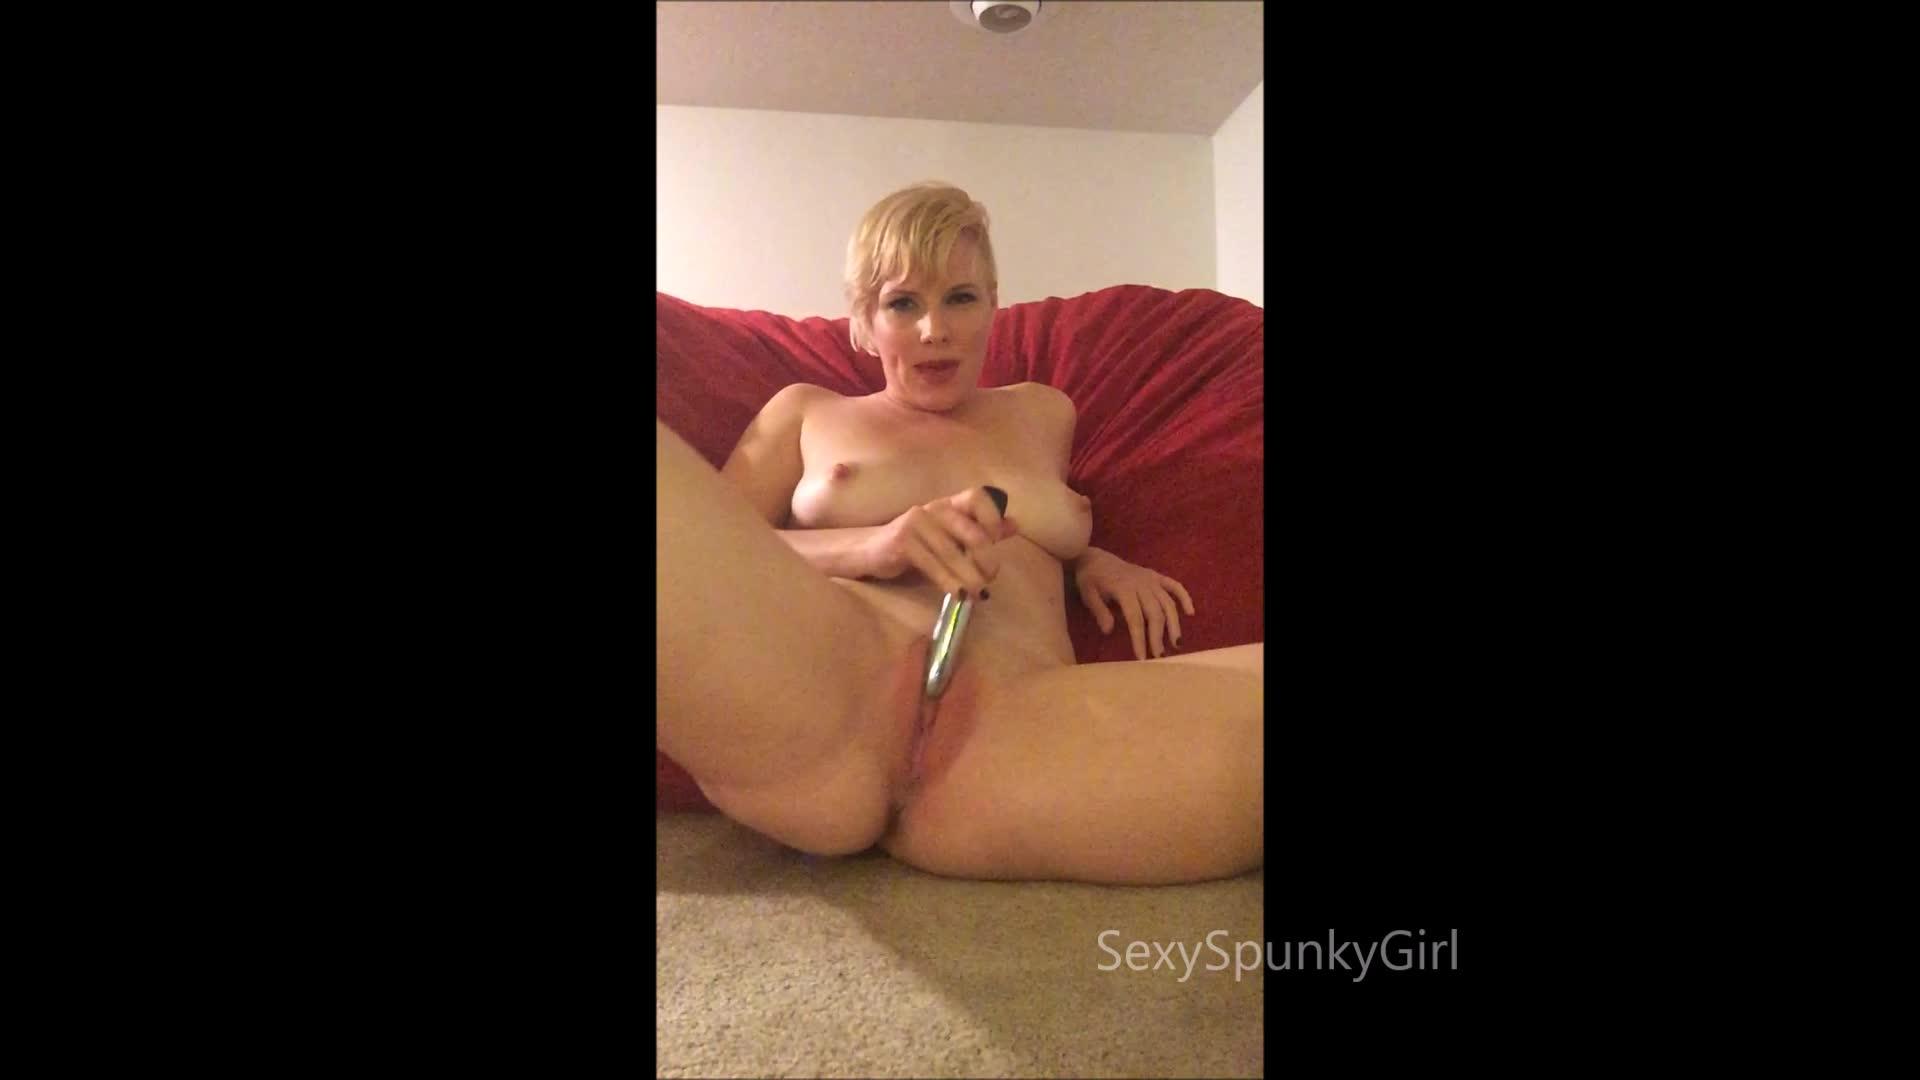 SexySpunkyGirl'd vid